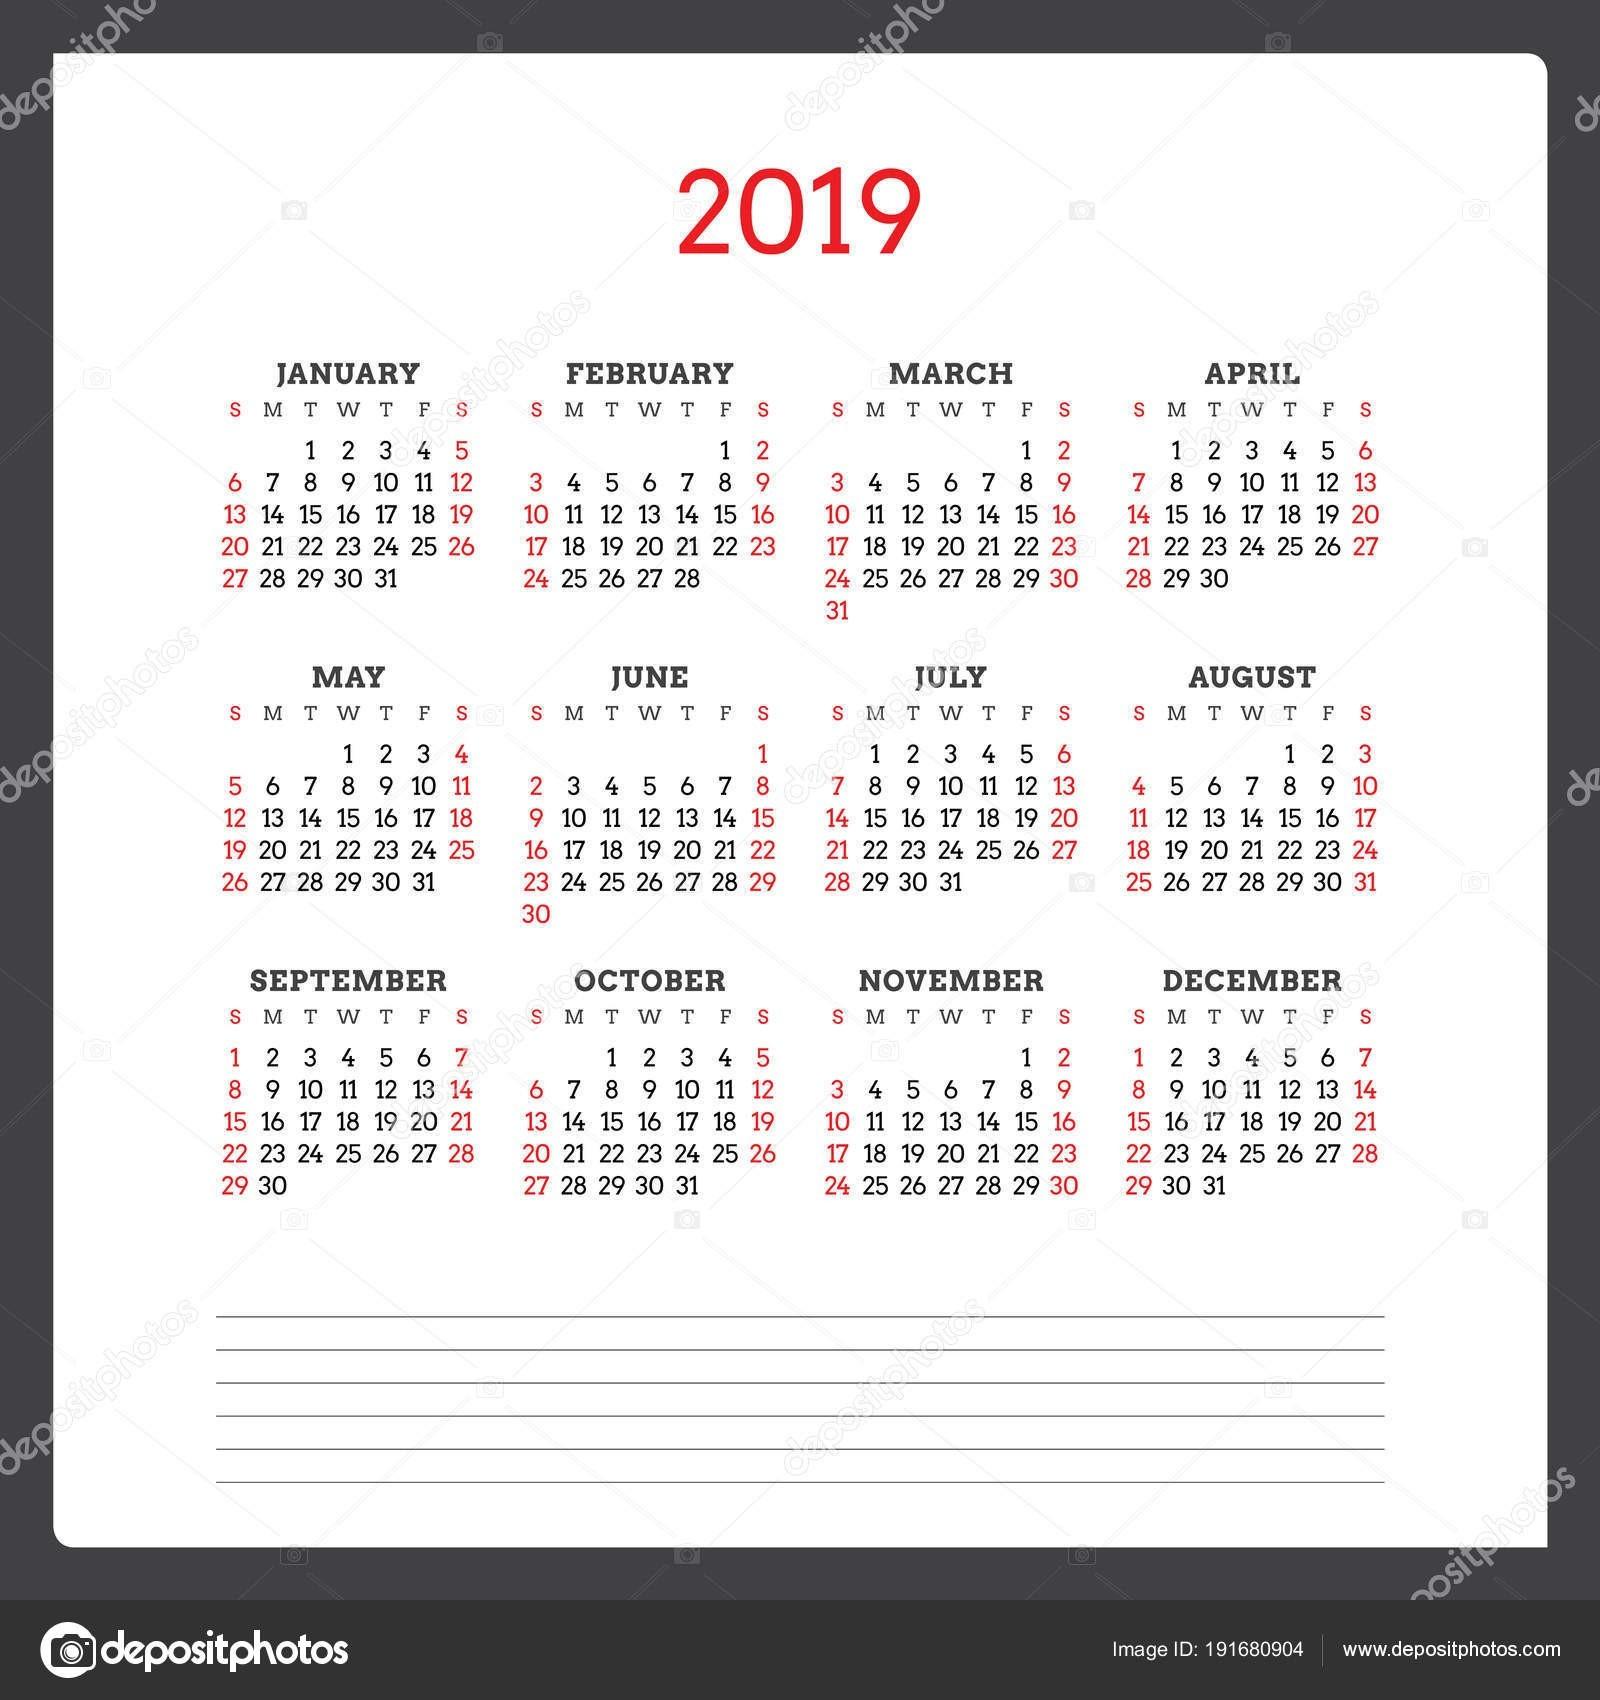 Calendario Utpl Octubre 2019 Febrero 2020 A Distancia Más Recientemente Liberado Noticias Calendario 2019 Para Imprimir Con Feriados Mexico Of Calendario Utpl Octubre 2019 Febrero 2020 A Distancia Más Arriba-a-fecha Memorias issn Kipdf